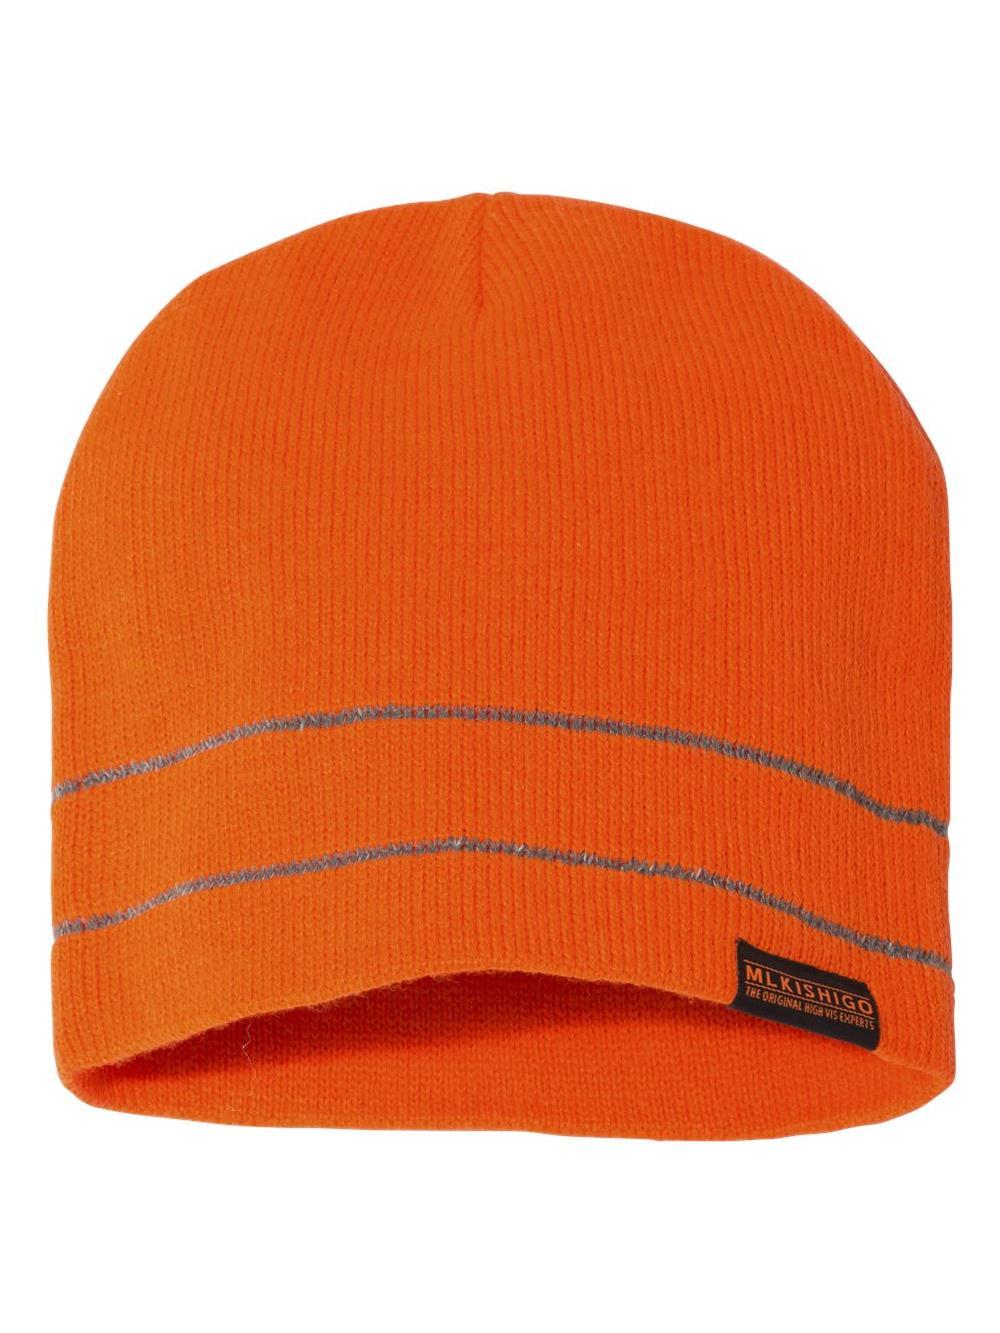 ML Kishigo Workwear Oralite? All Mesh Vest 1076-1077